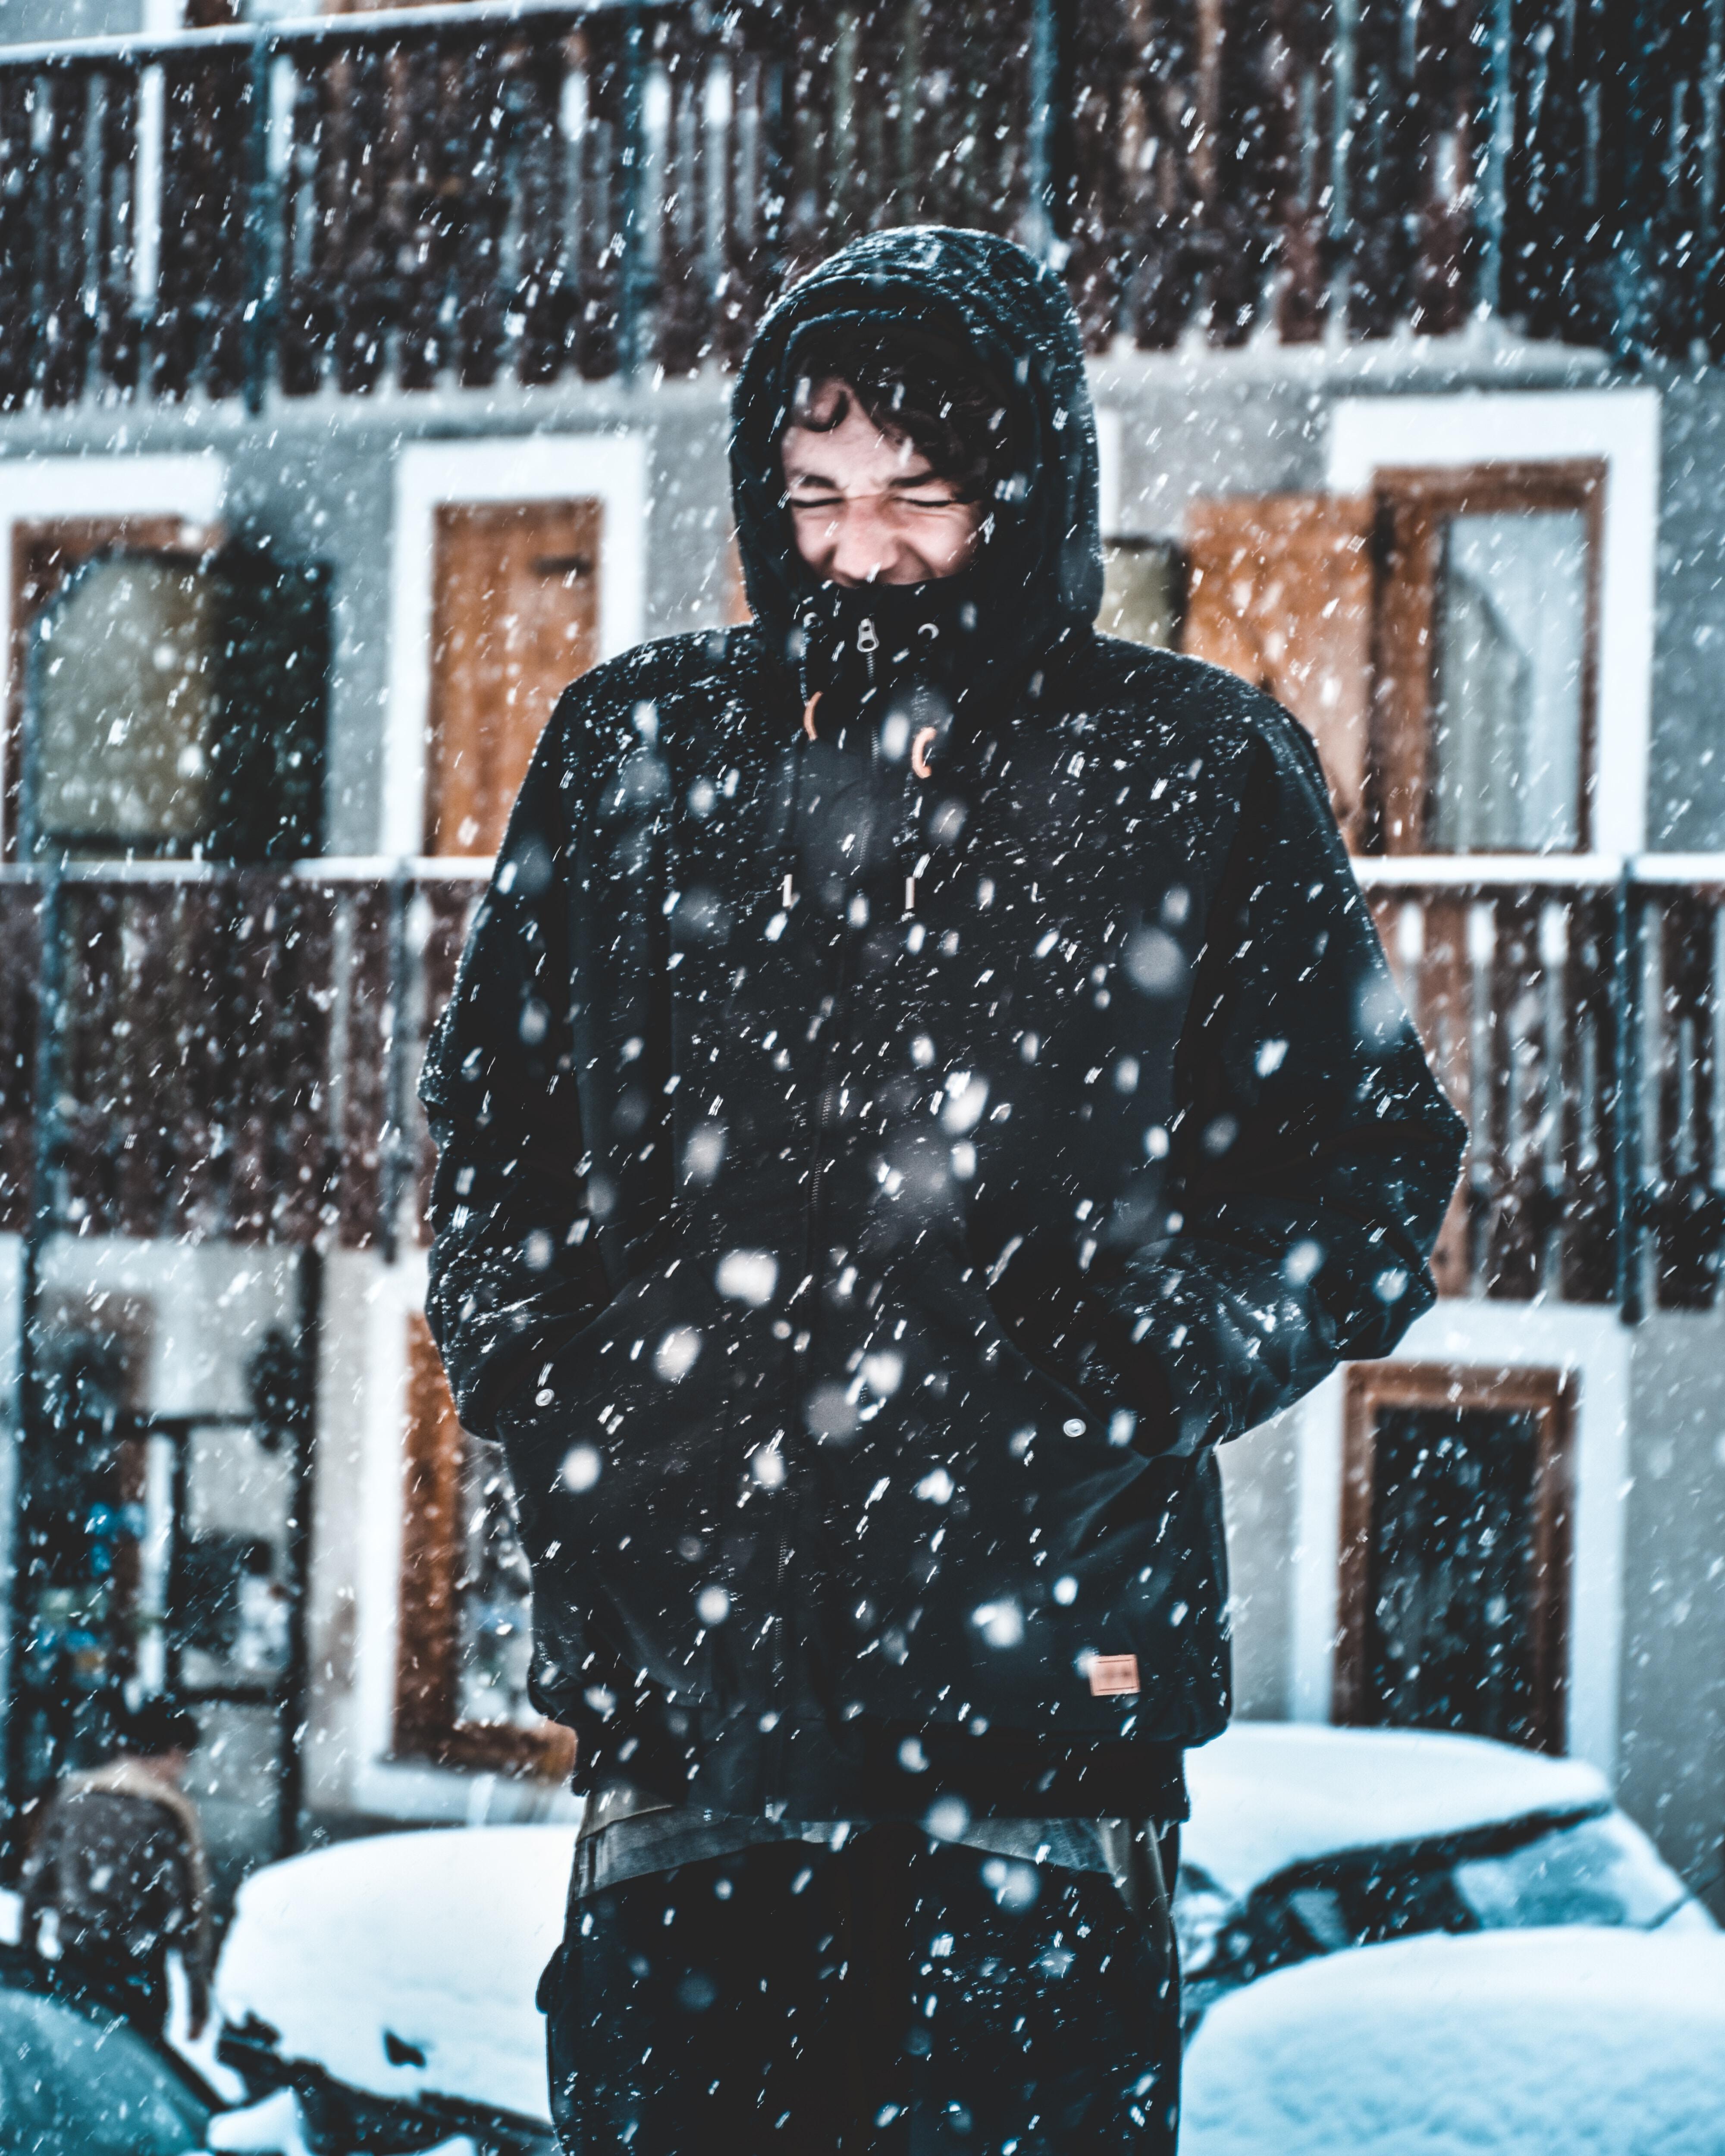 man in black hooded jacket during snow rain